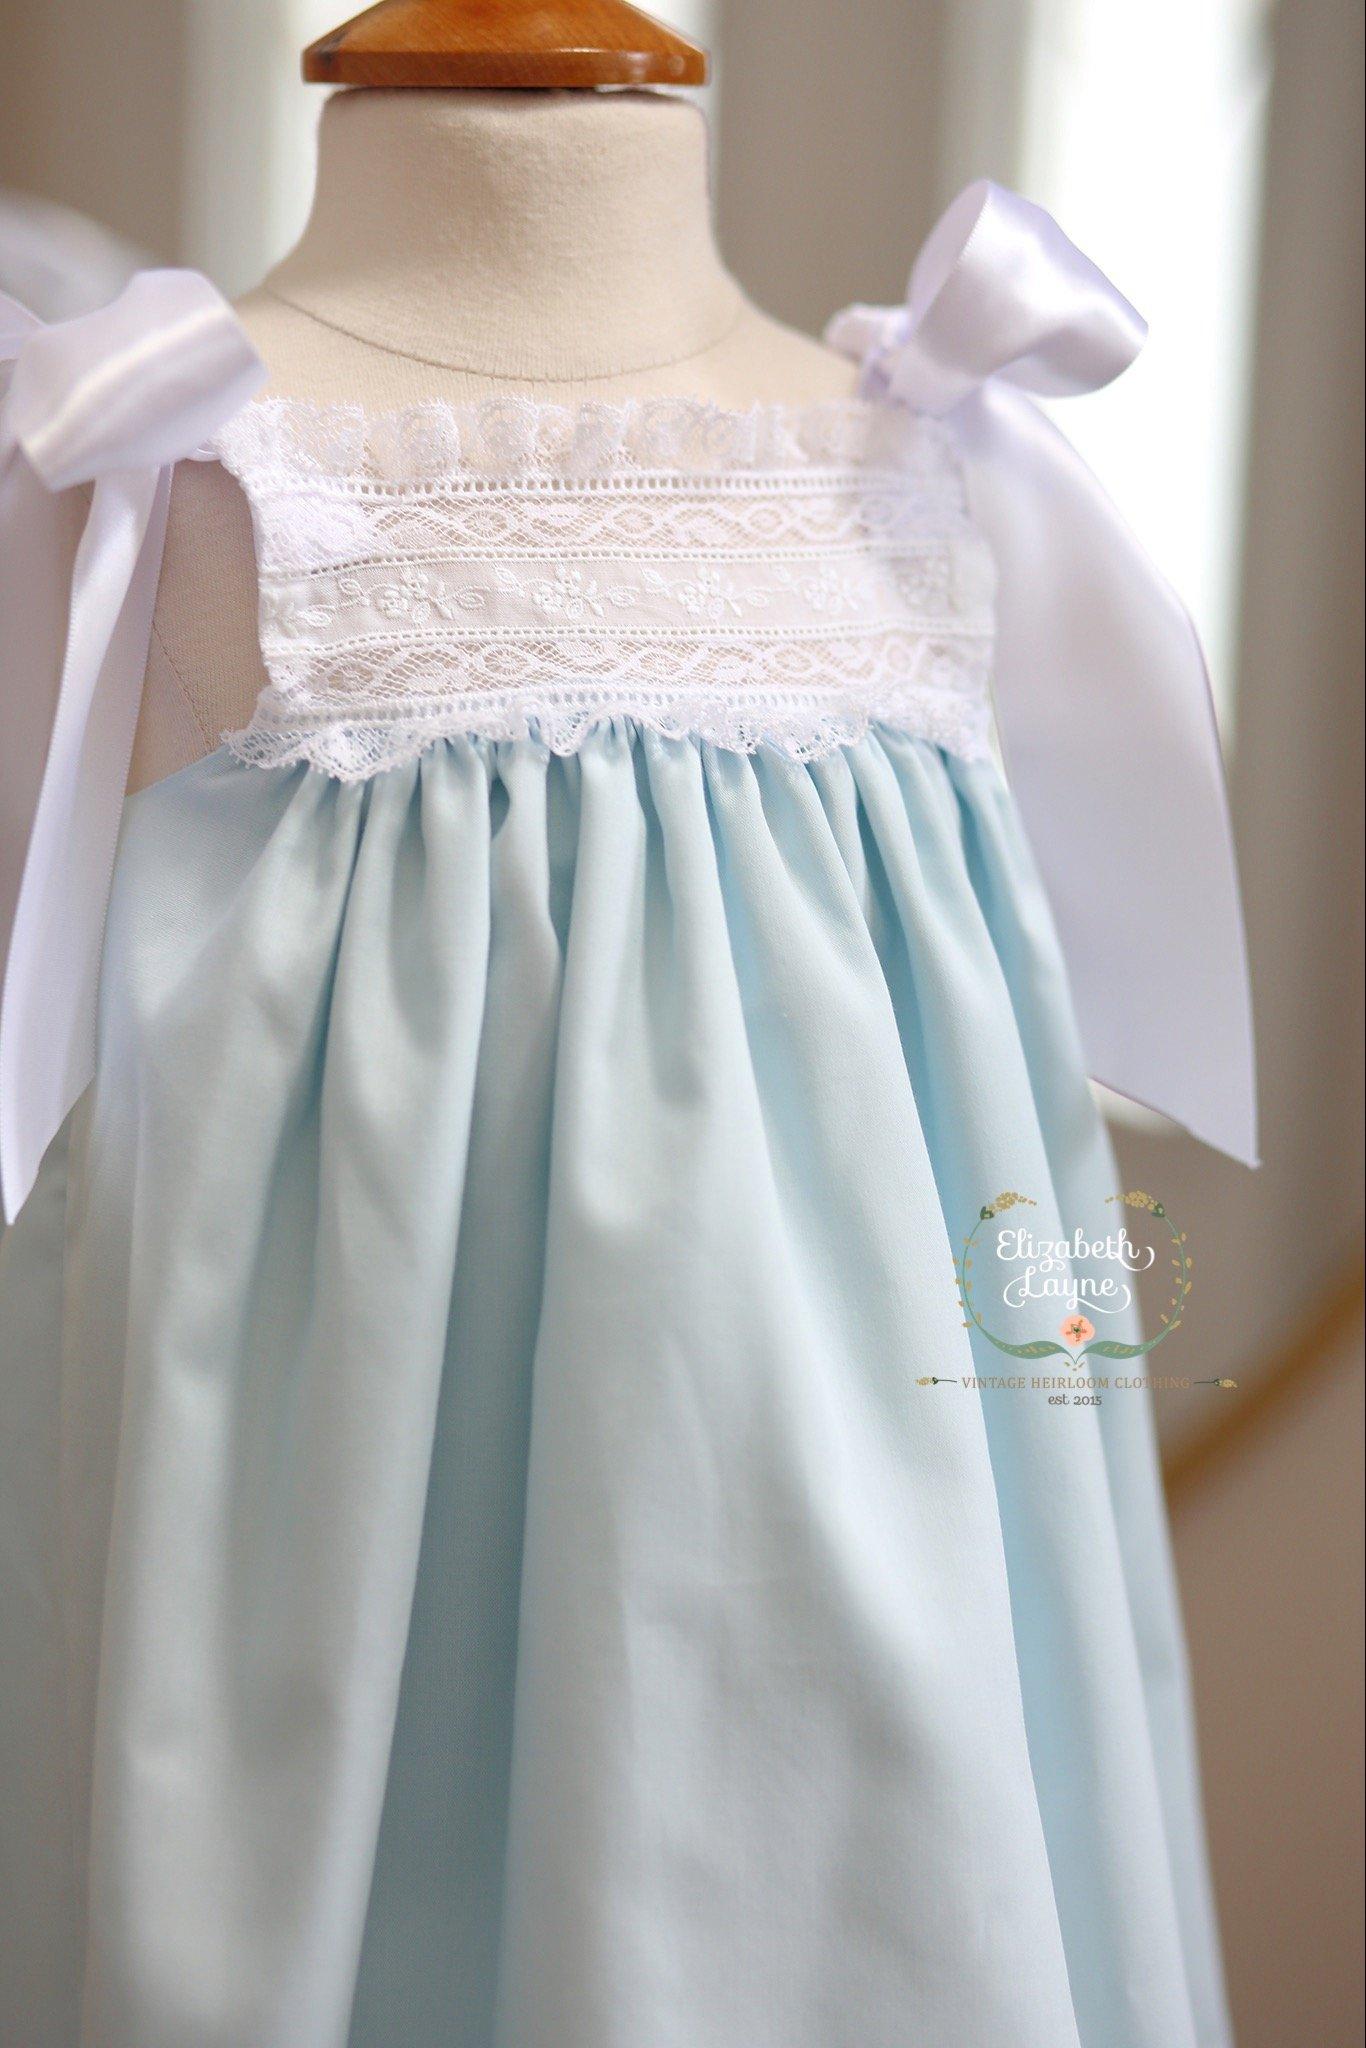 Image of The 'Layne' Ribbon Heirloom Dress